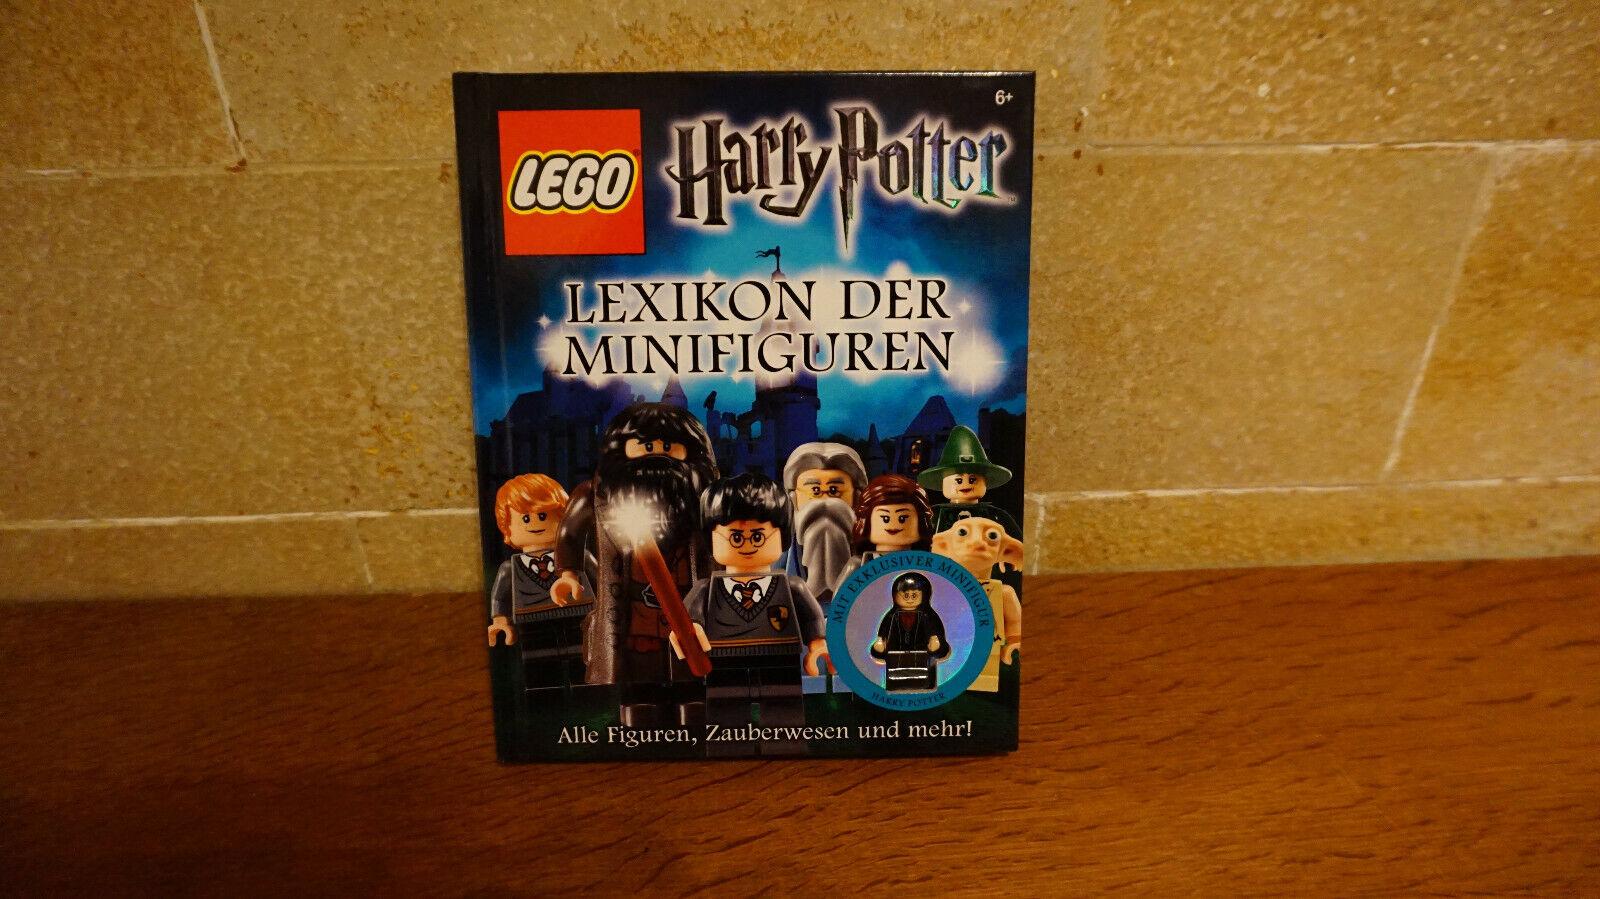 Lego Harry Potter Lexikon der Minifiguren